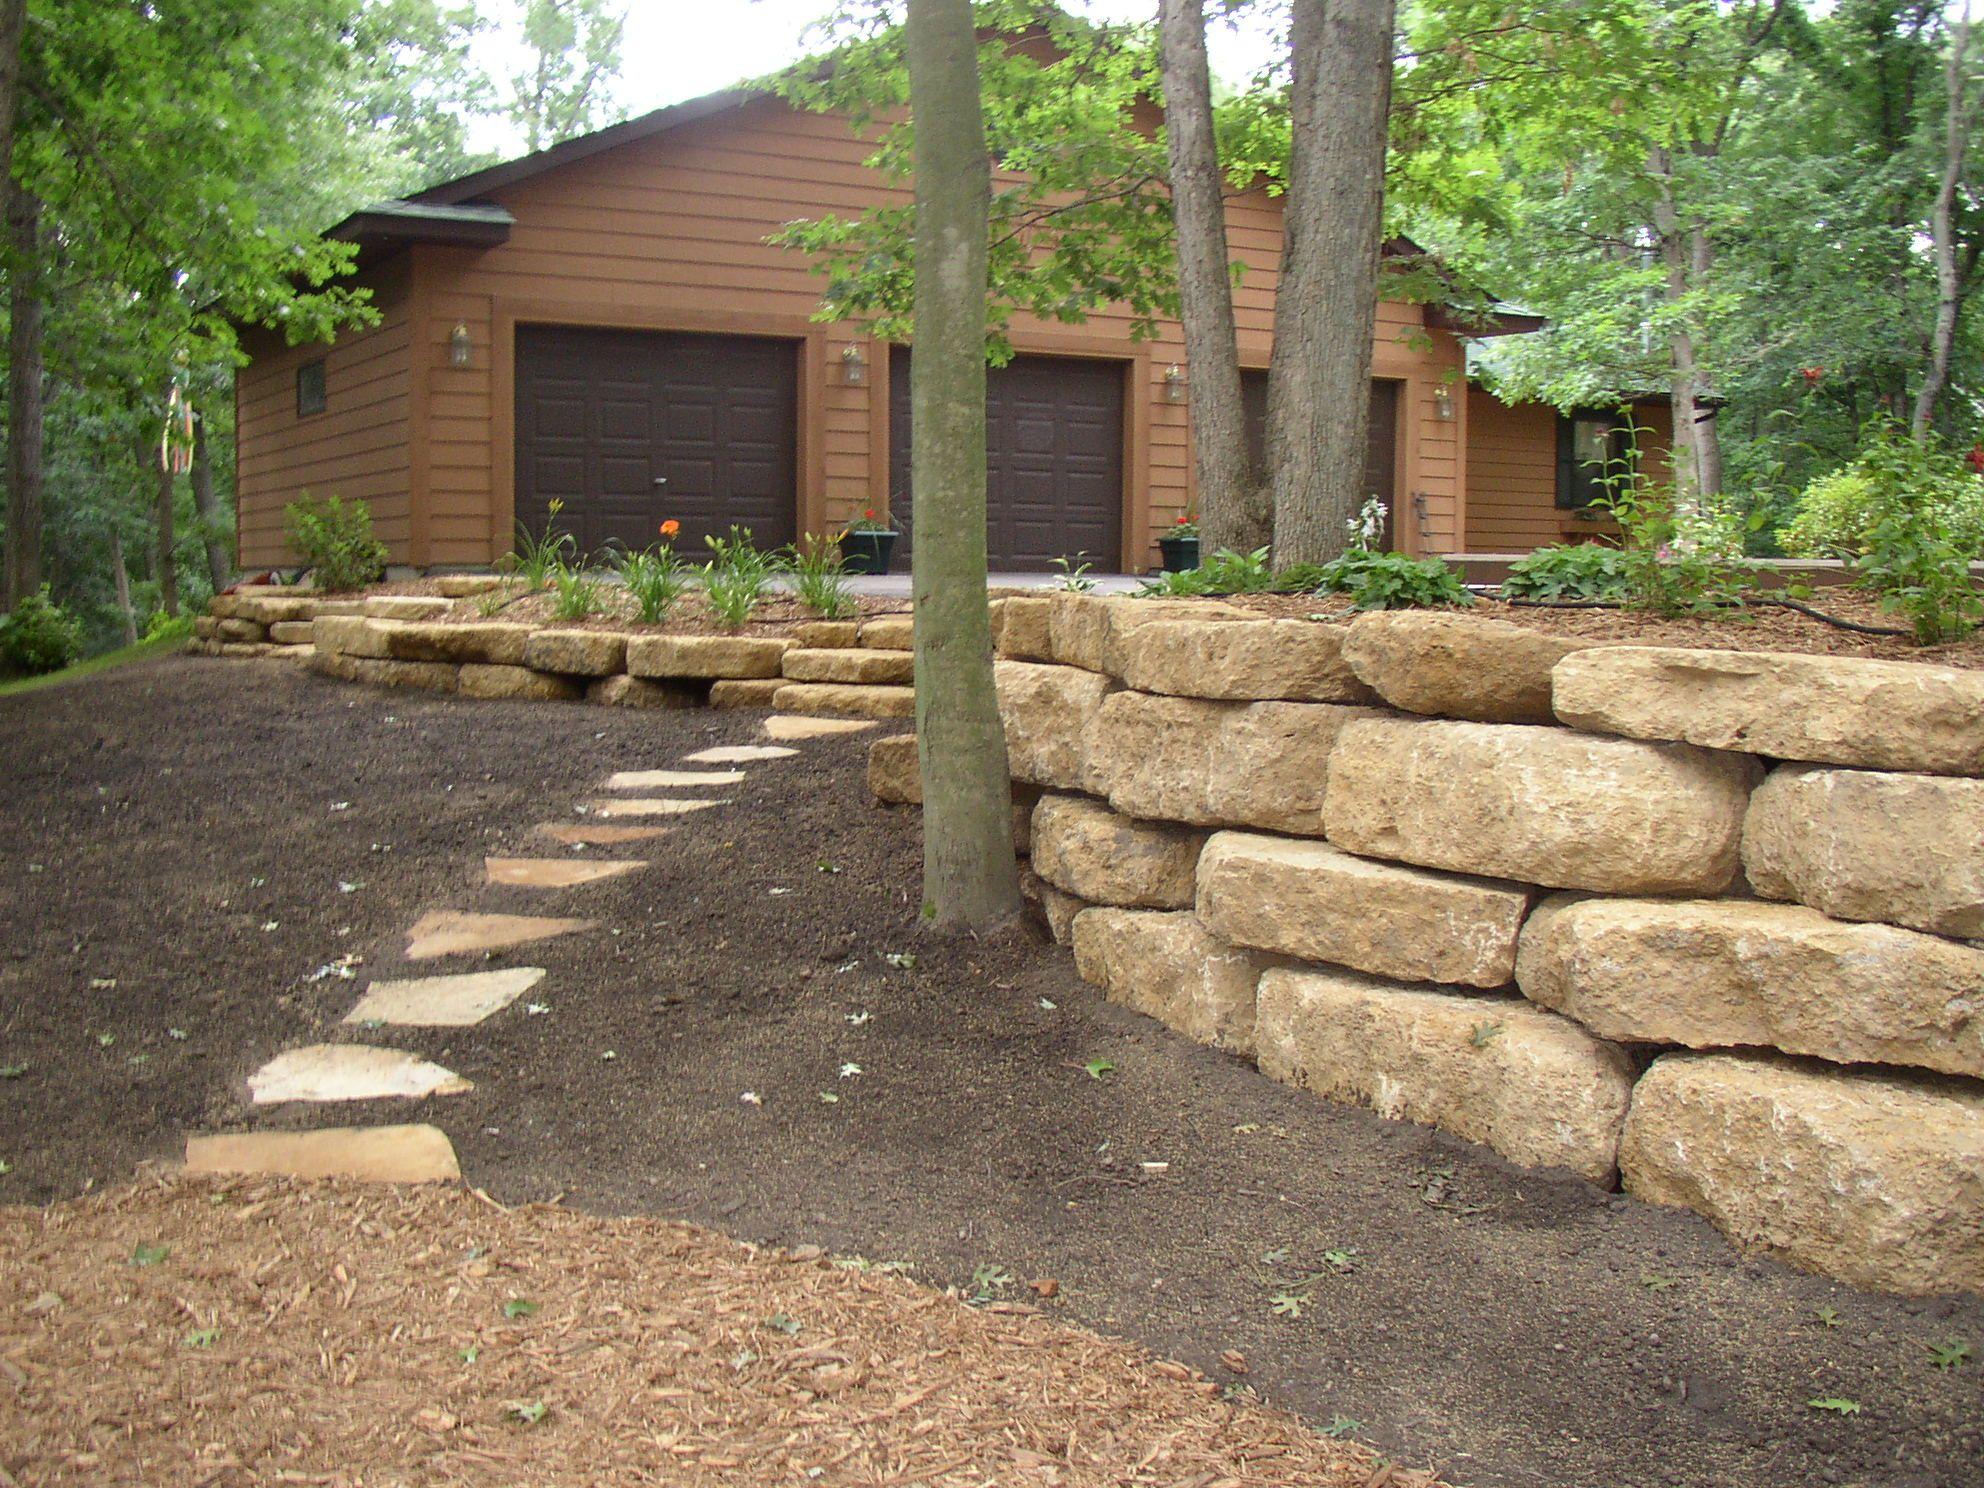 Landscaping Retaining Walls Ideas Landscapingideas Landscaping Retaining Walls Stone Landscaping Large Backyard Landscaping